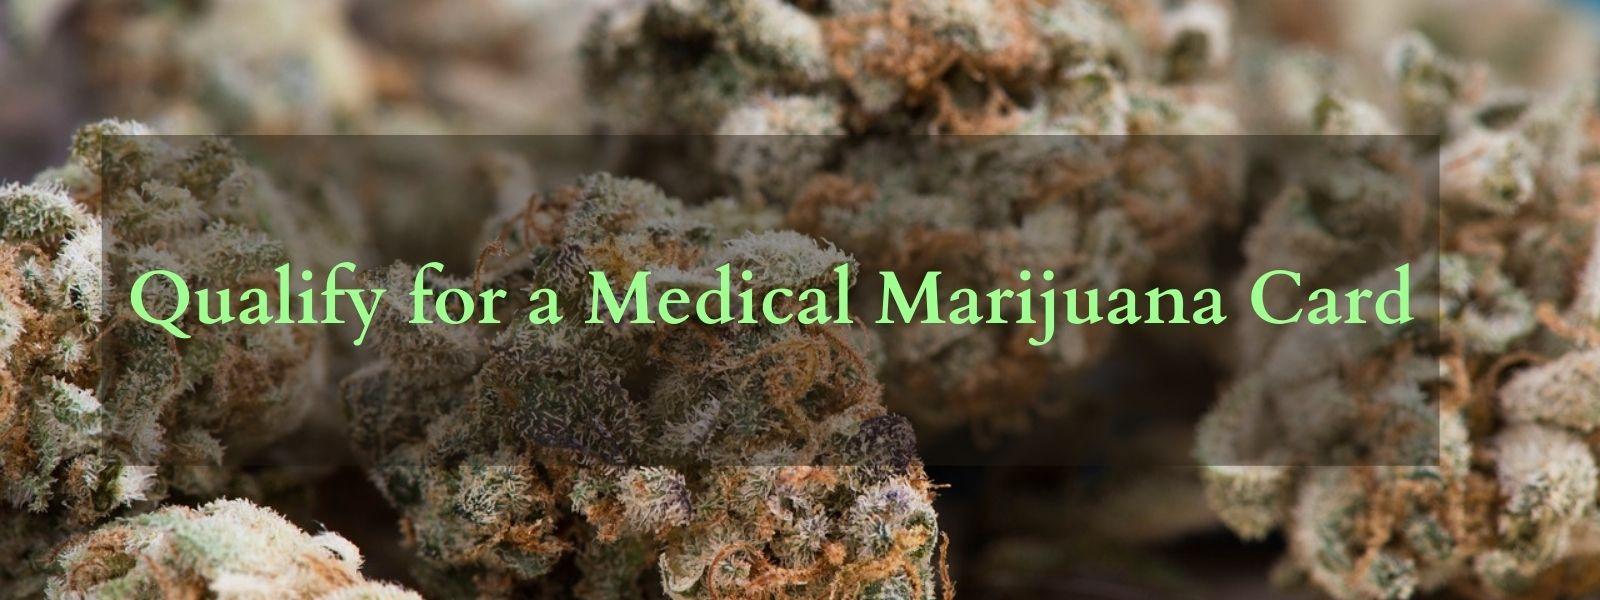 Qualify for a Medical Marijuana Card